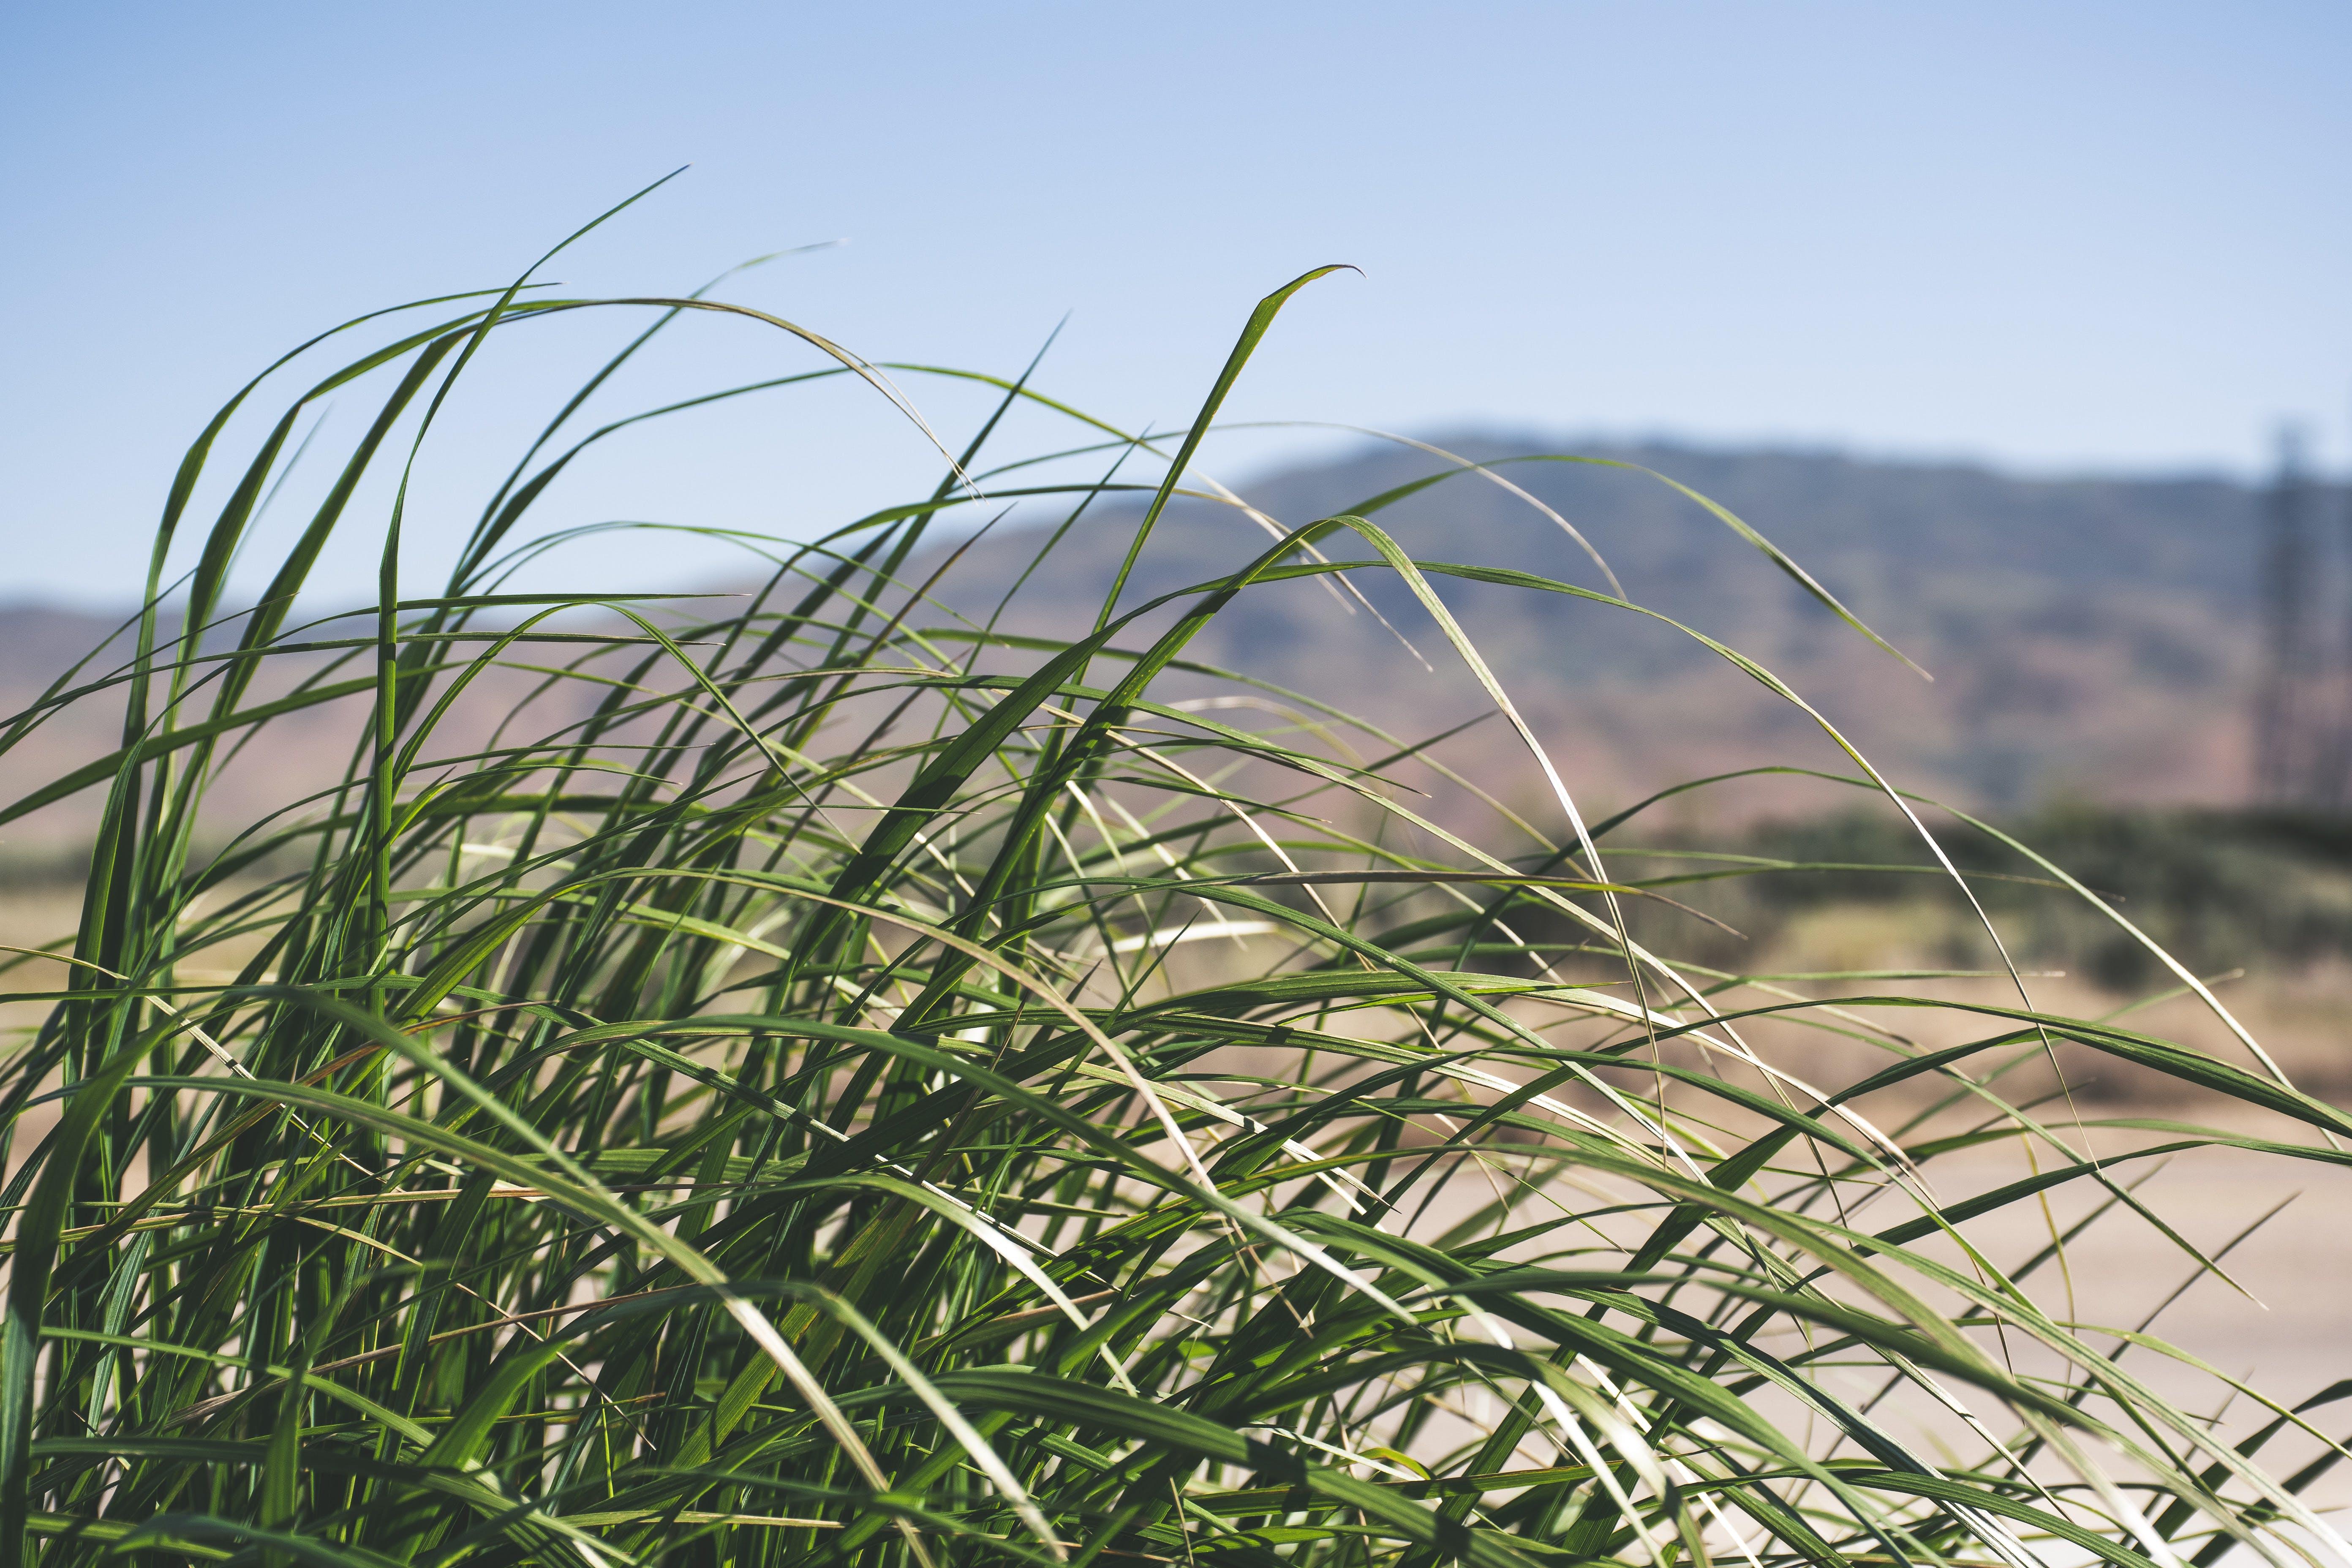 Closeup Photography of Green Grass